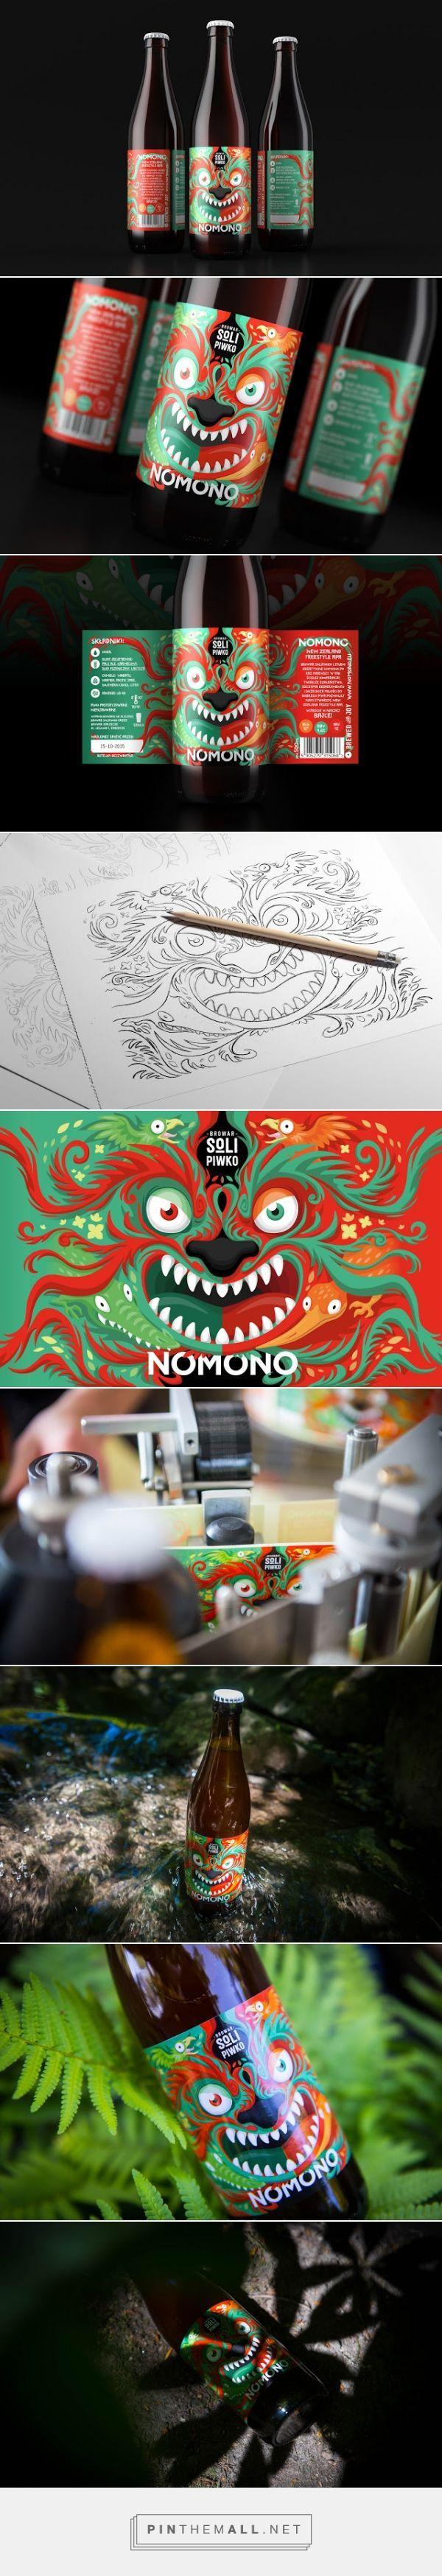 NOMONO #NewZealand Freestyle APA #beer #packaging designed by NOMONO - www.packagingofth...